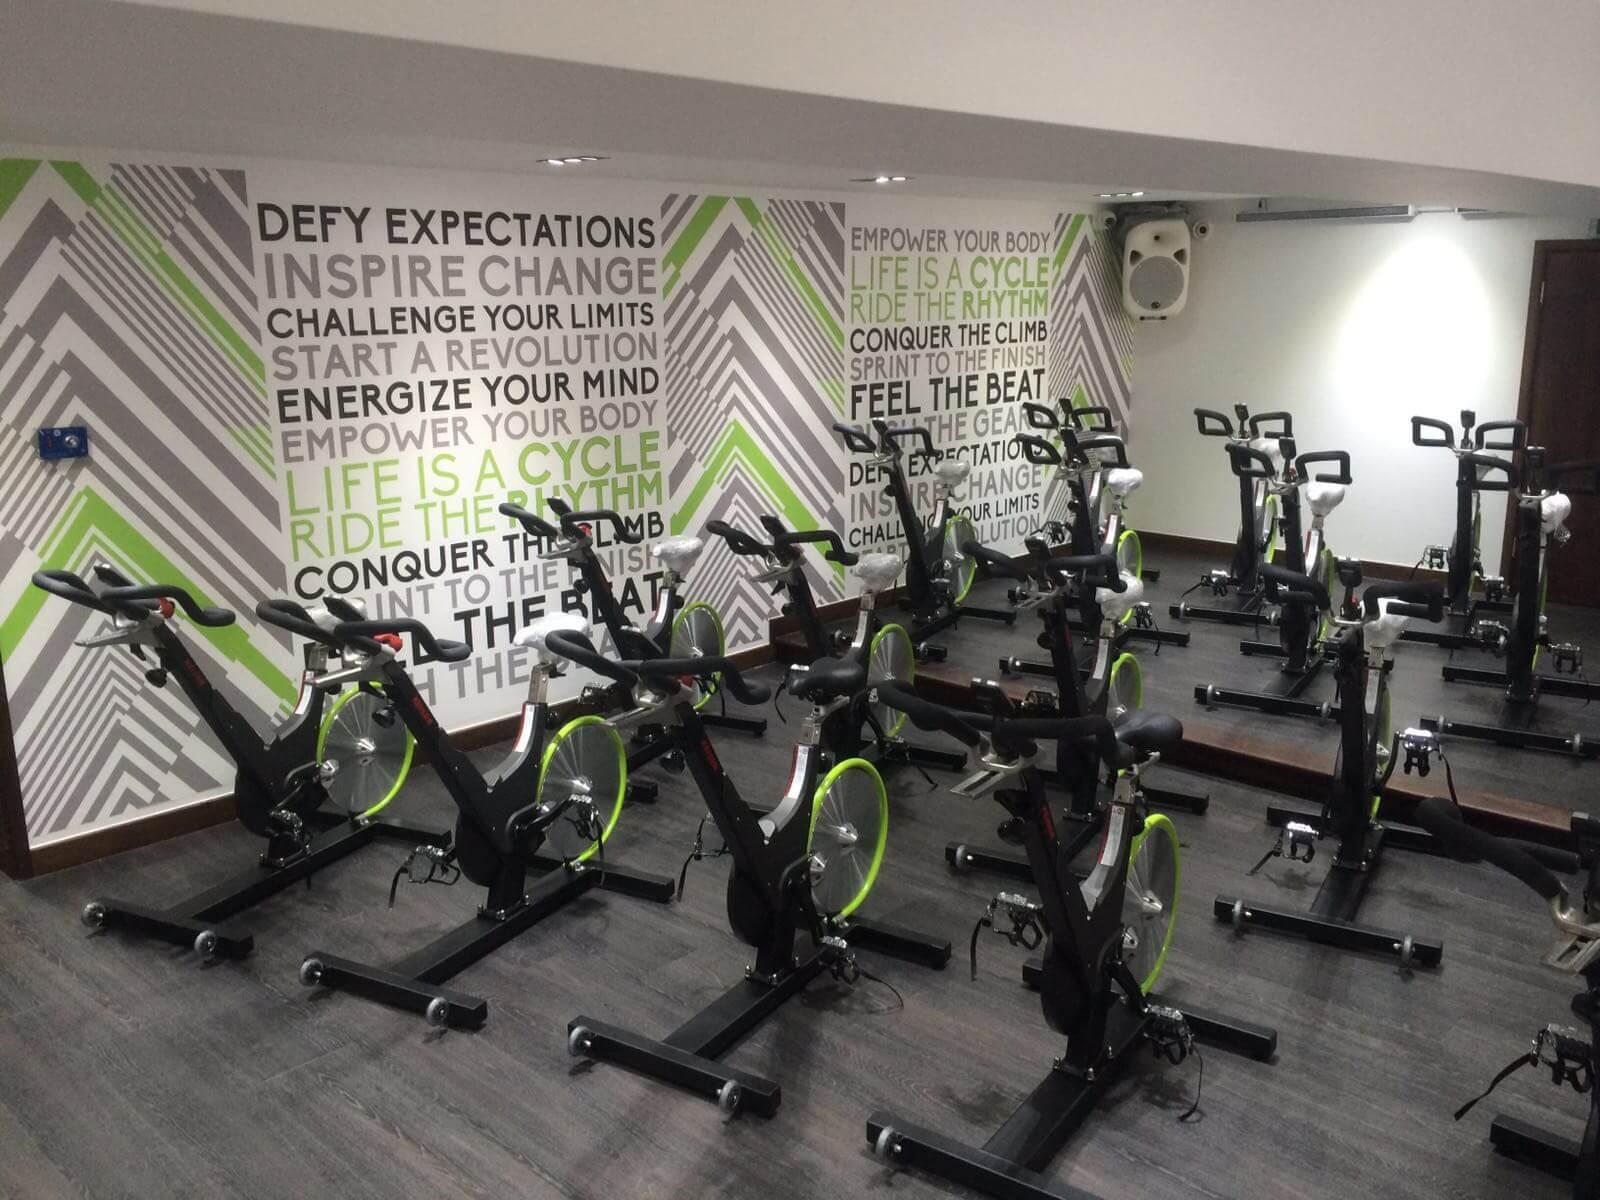 cycle studio gym refurbishment